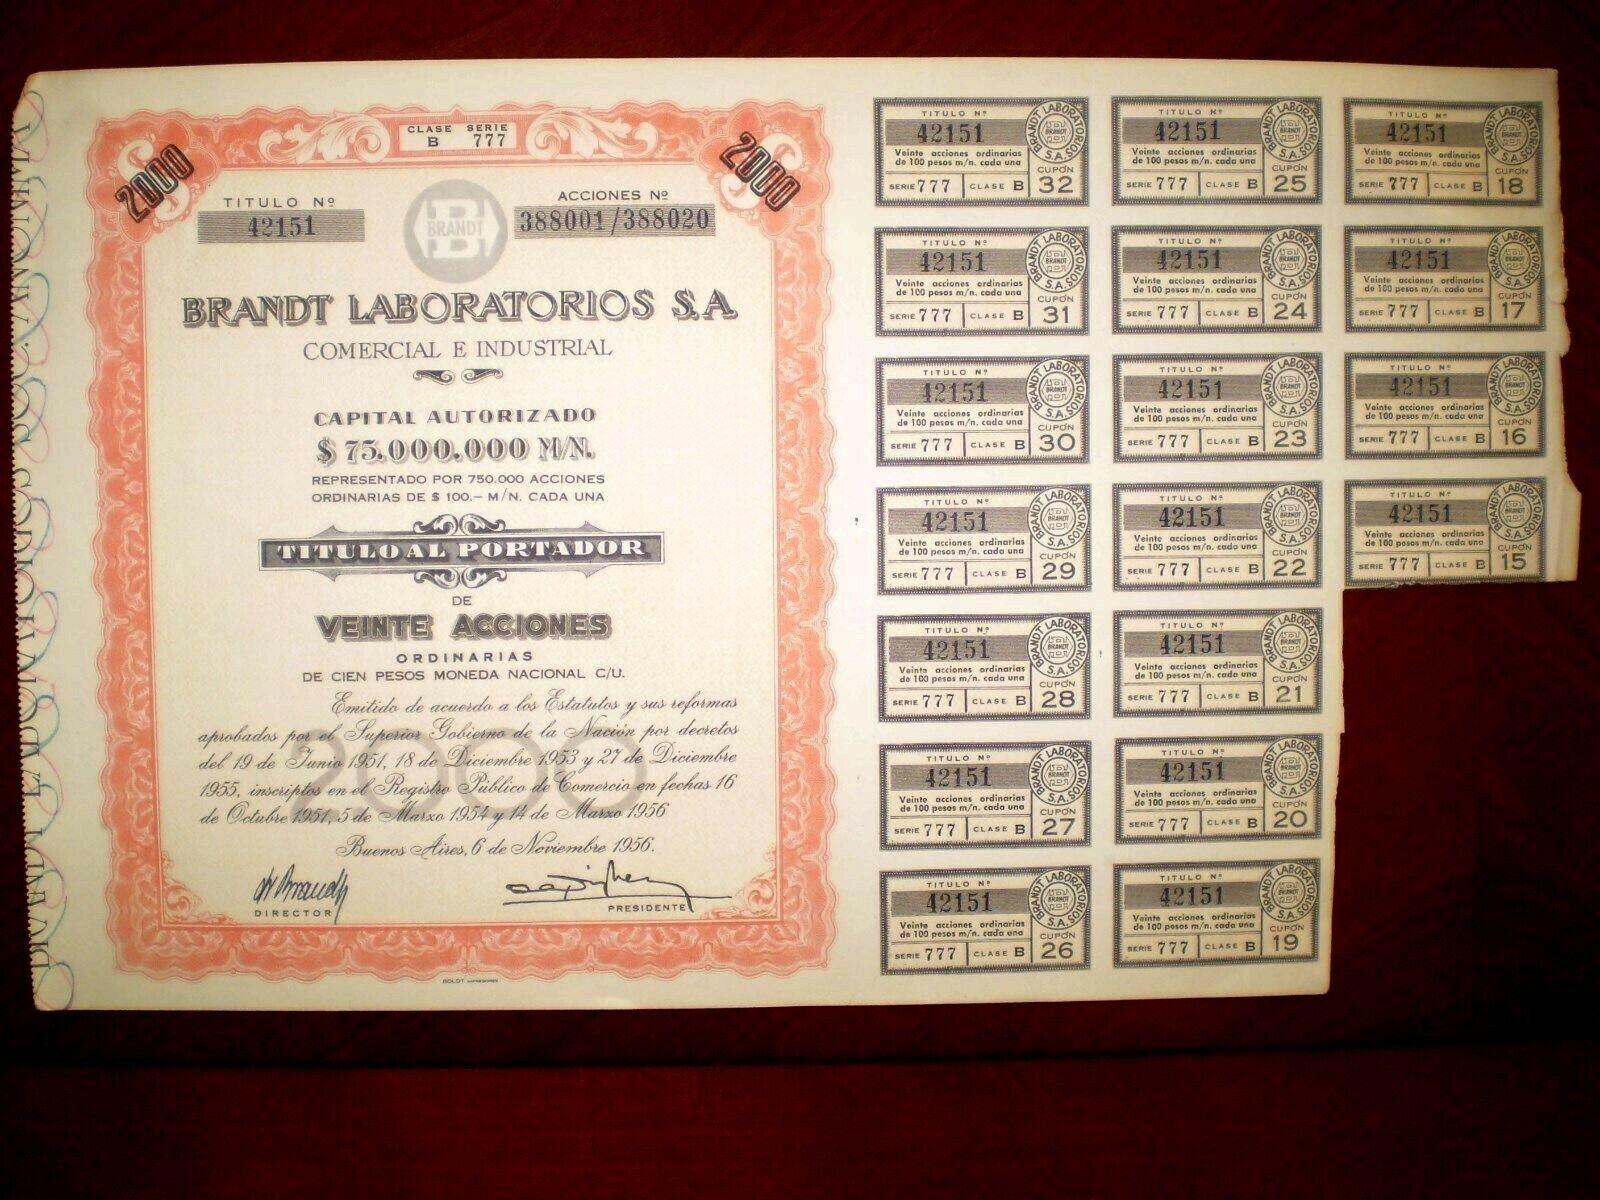 Brandt Laboratorios share certificate 1956 Argentina